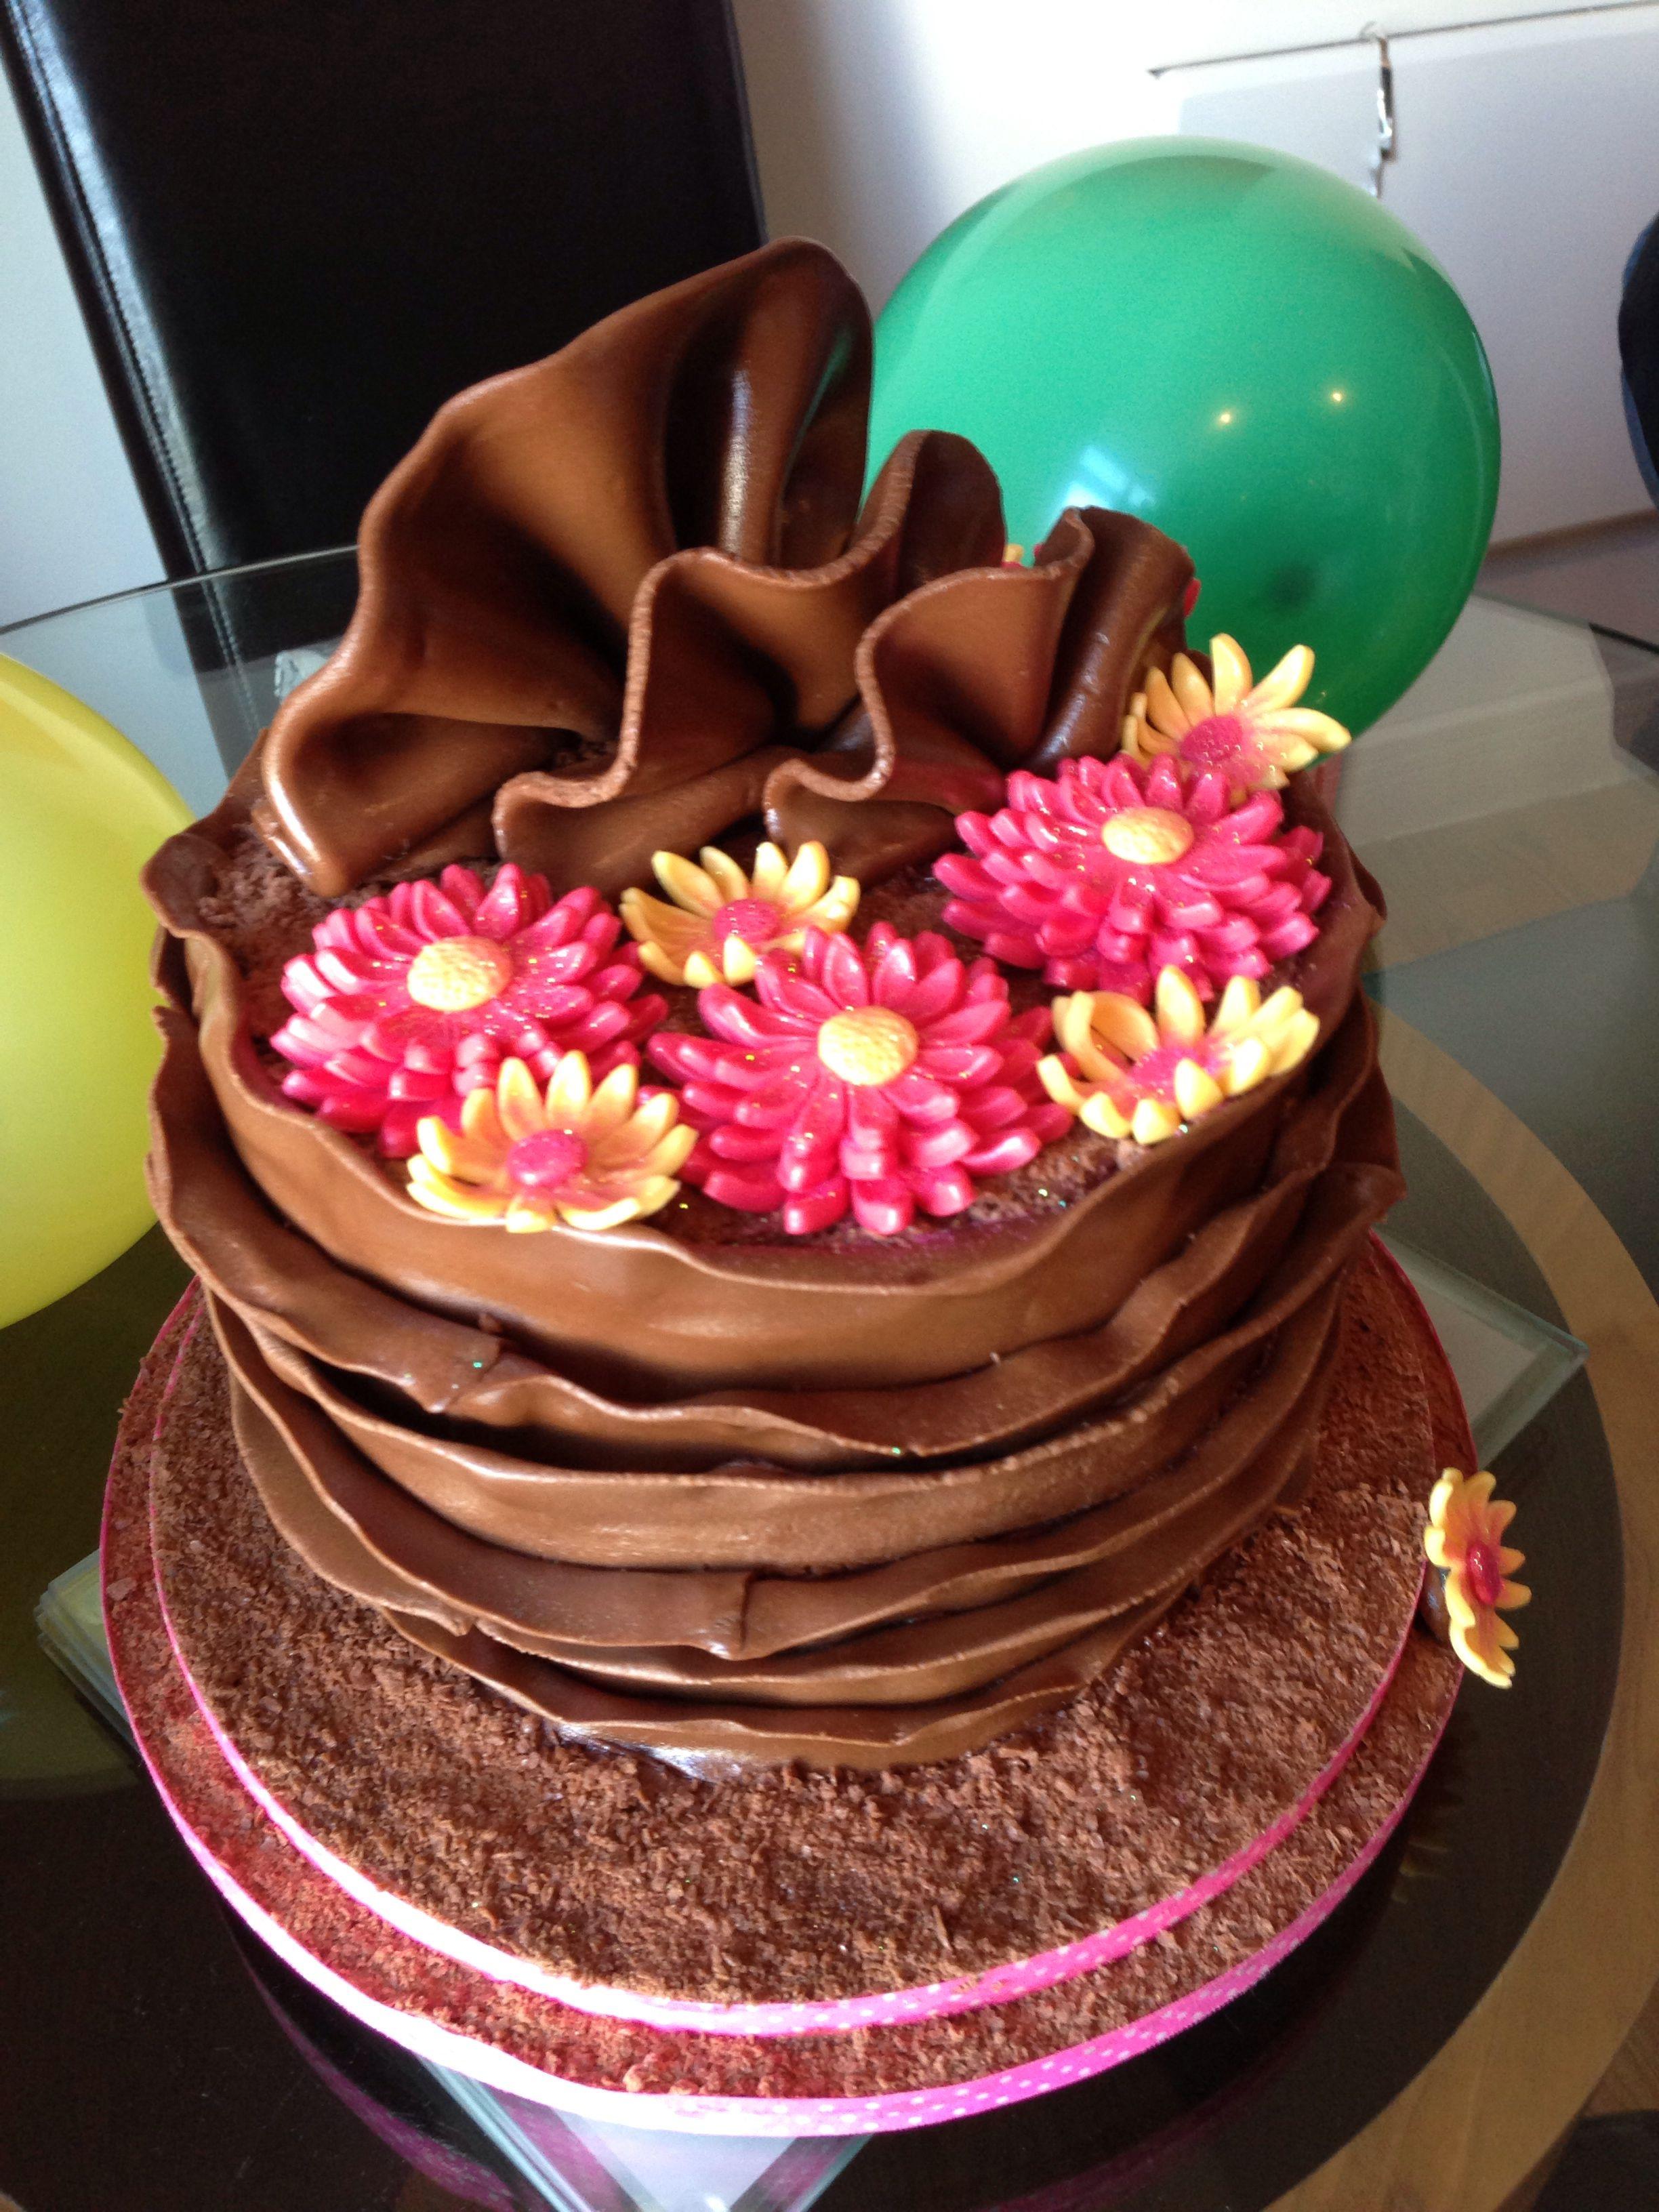 Chocolate mud cake with fondant flowers